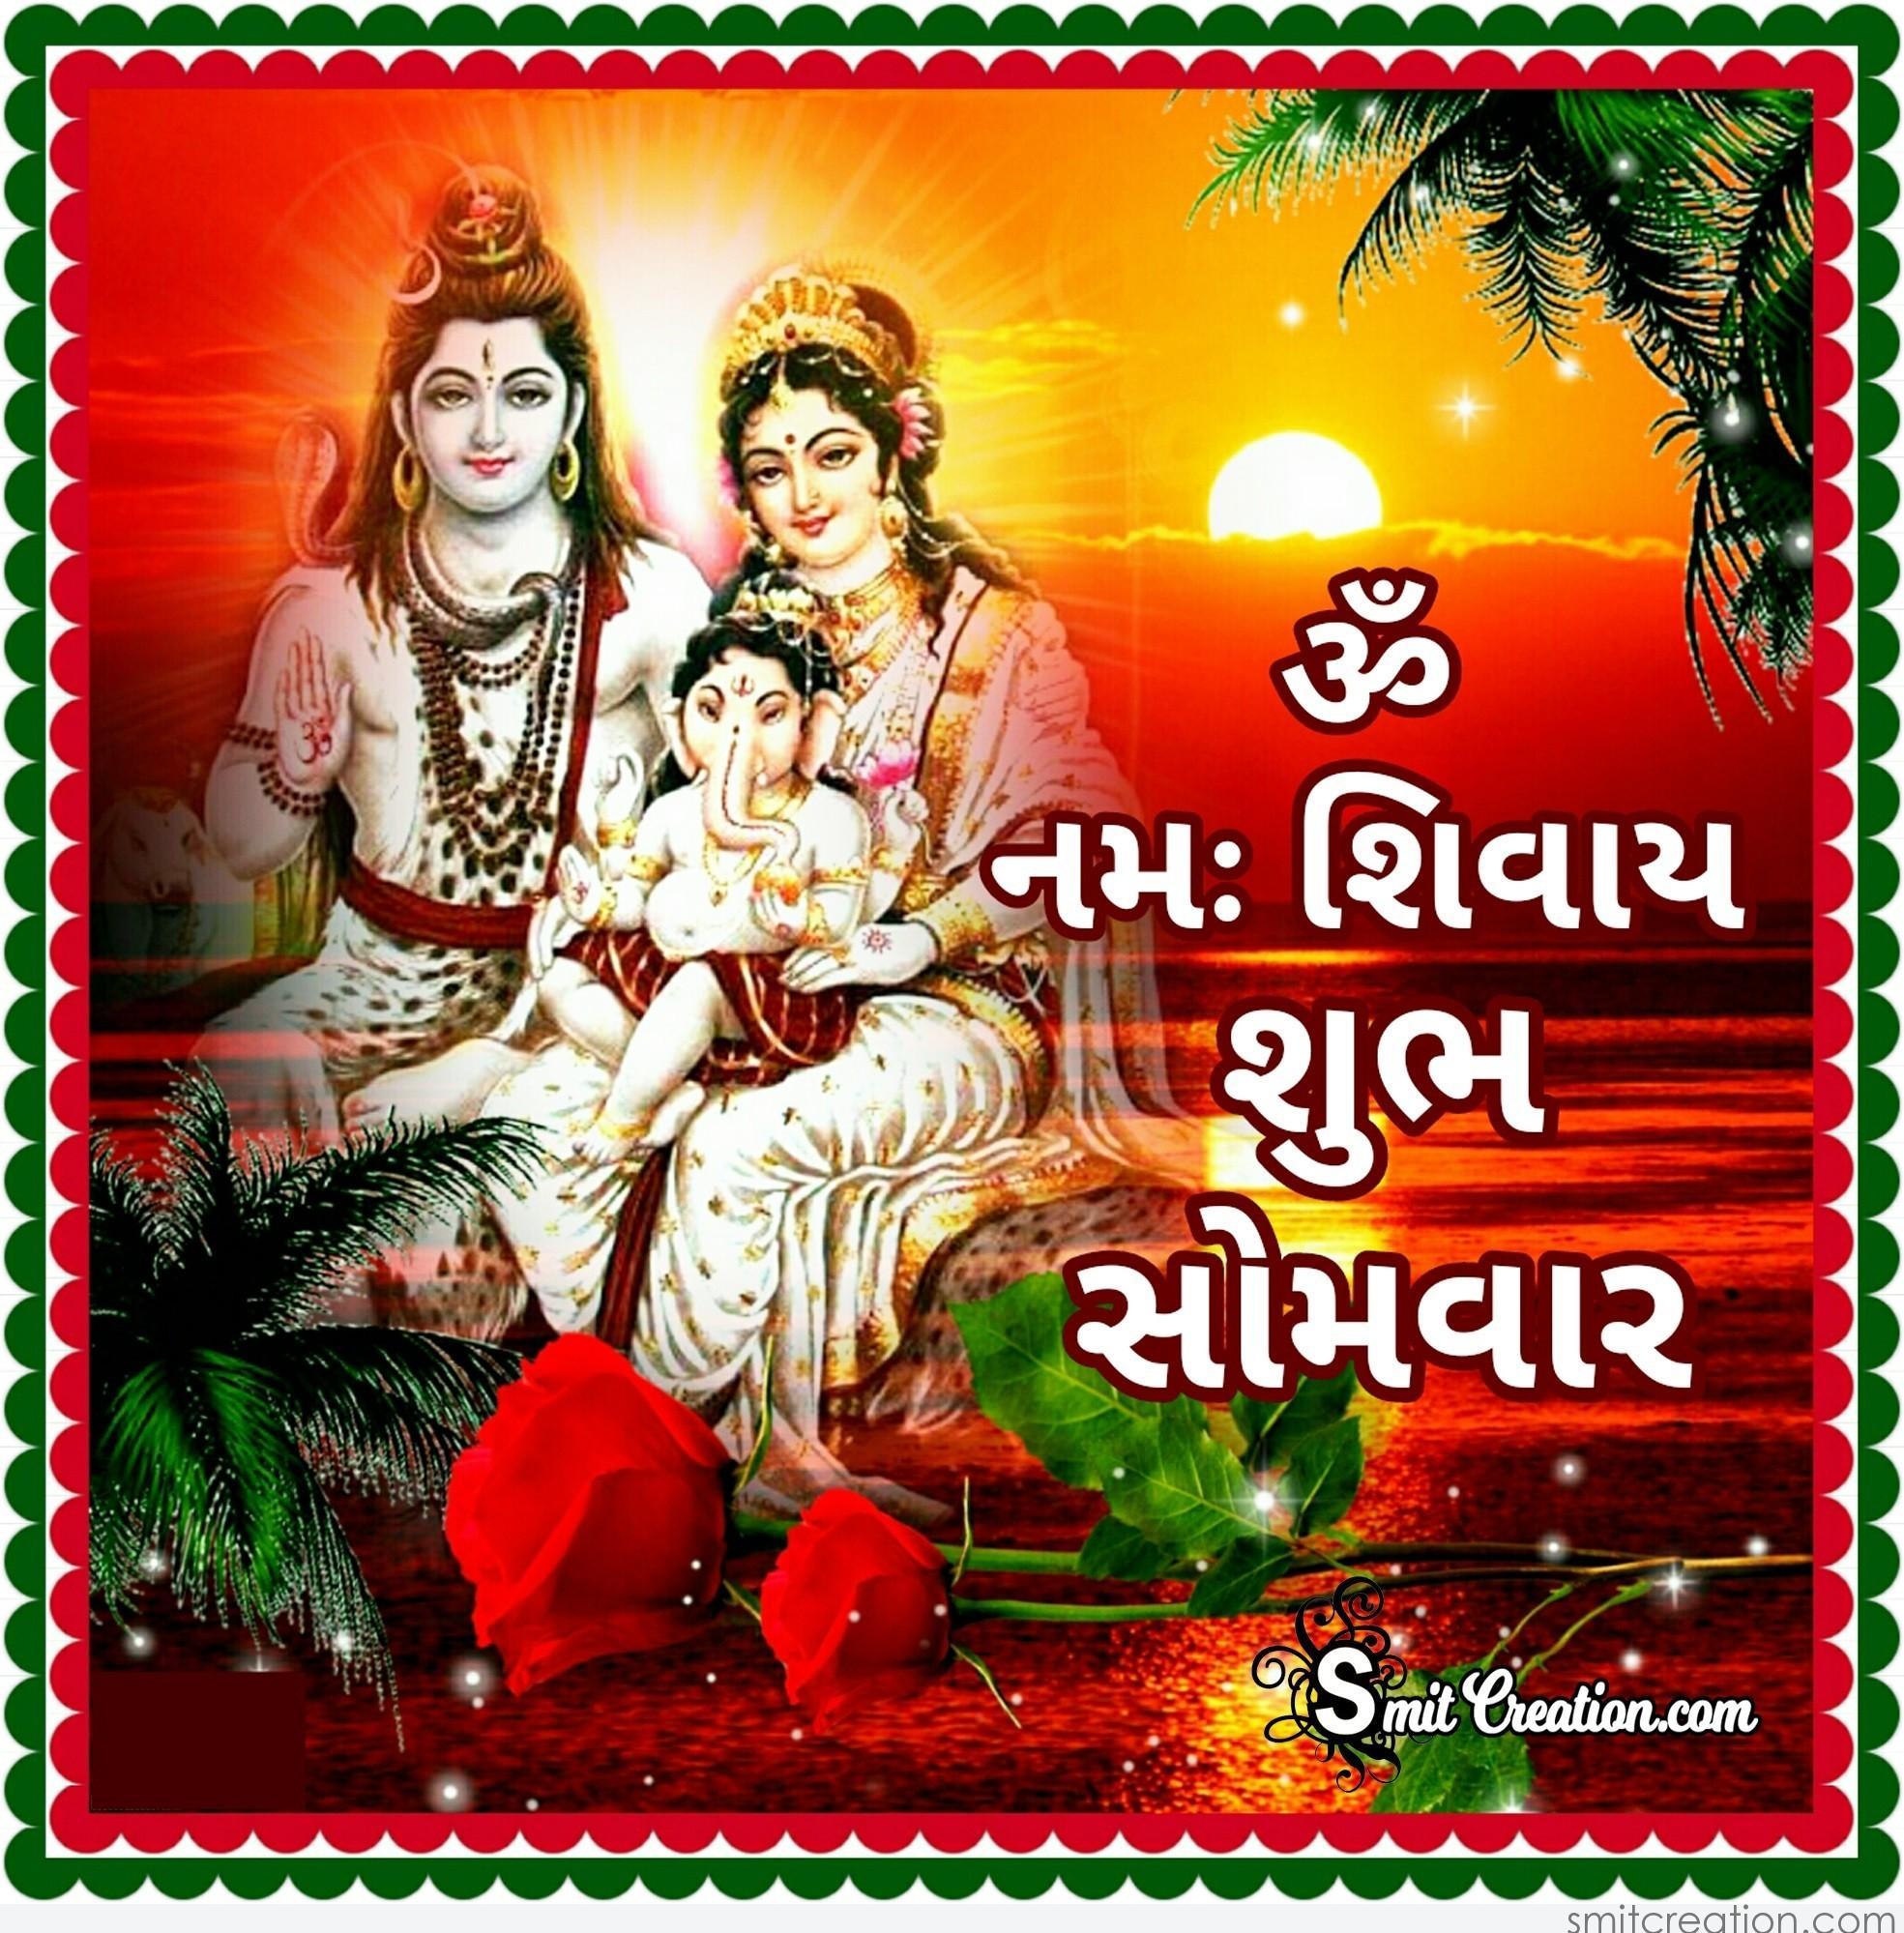 Shubh Somvar Smitcreation Com